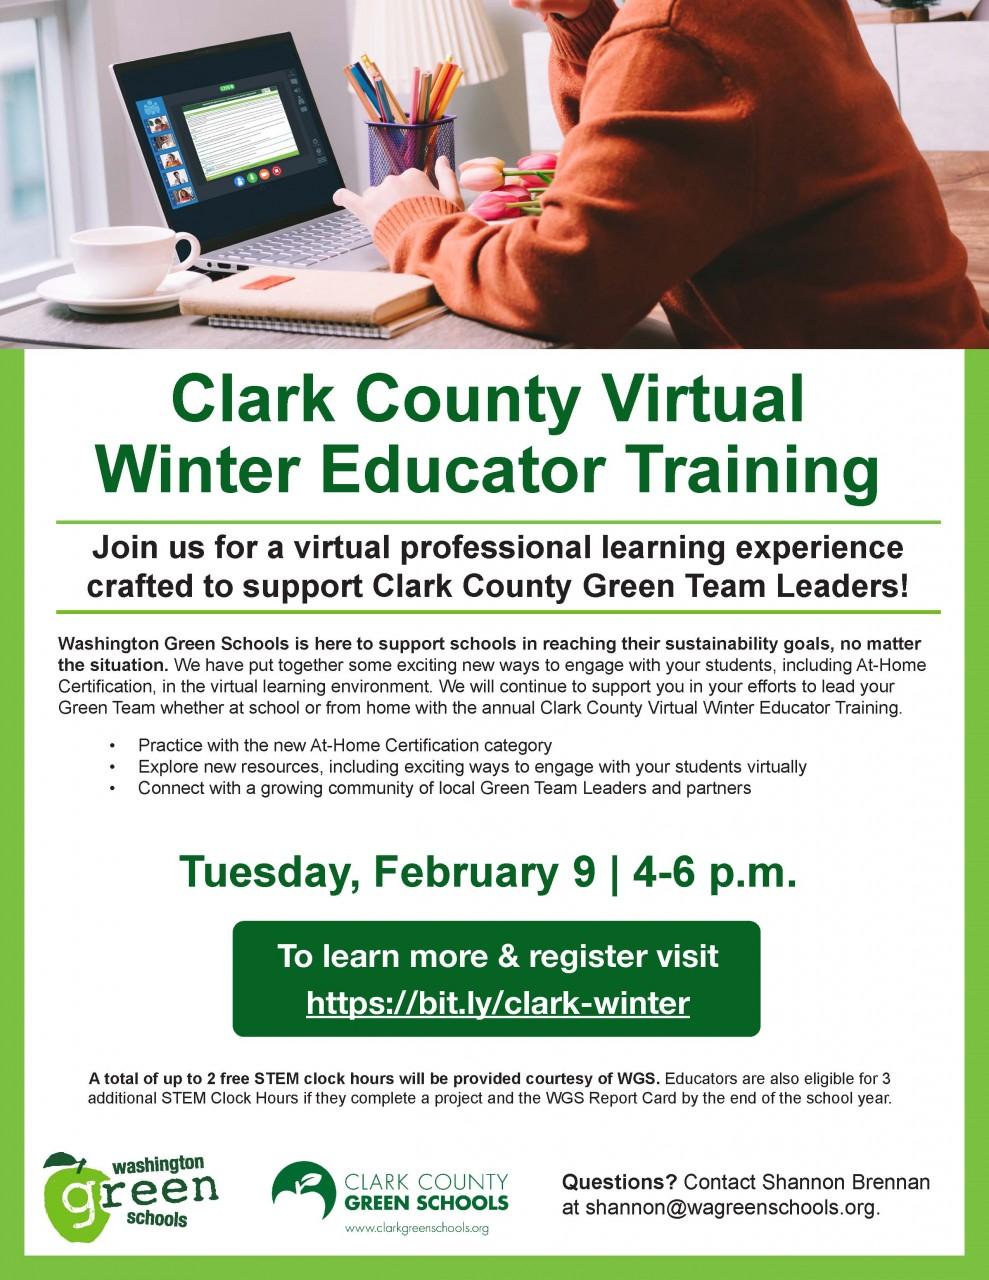 Washington Green Schools virtual winter training - February 9 - register now